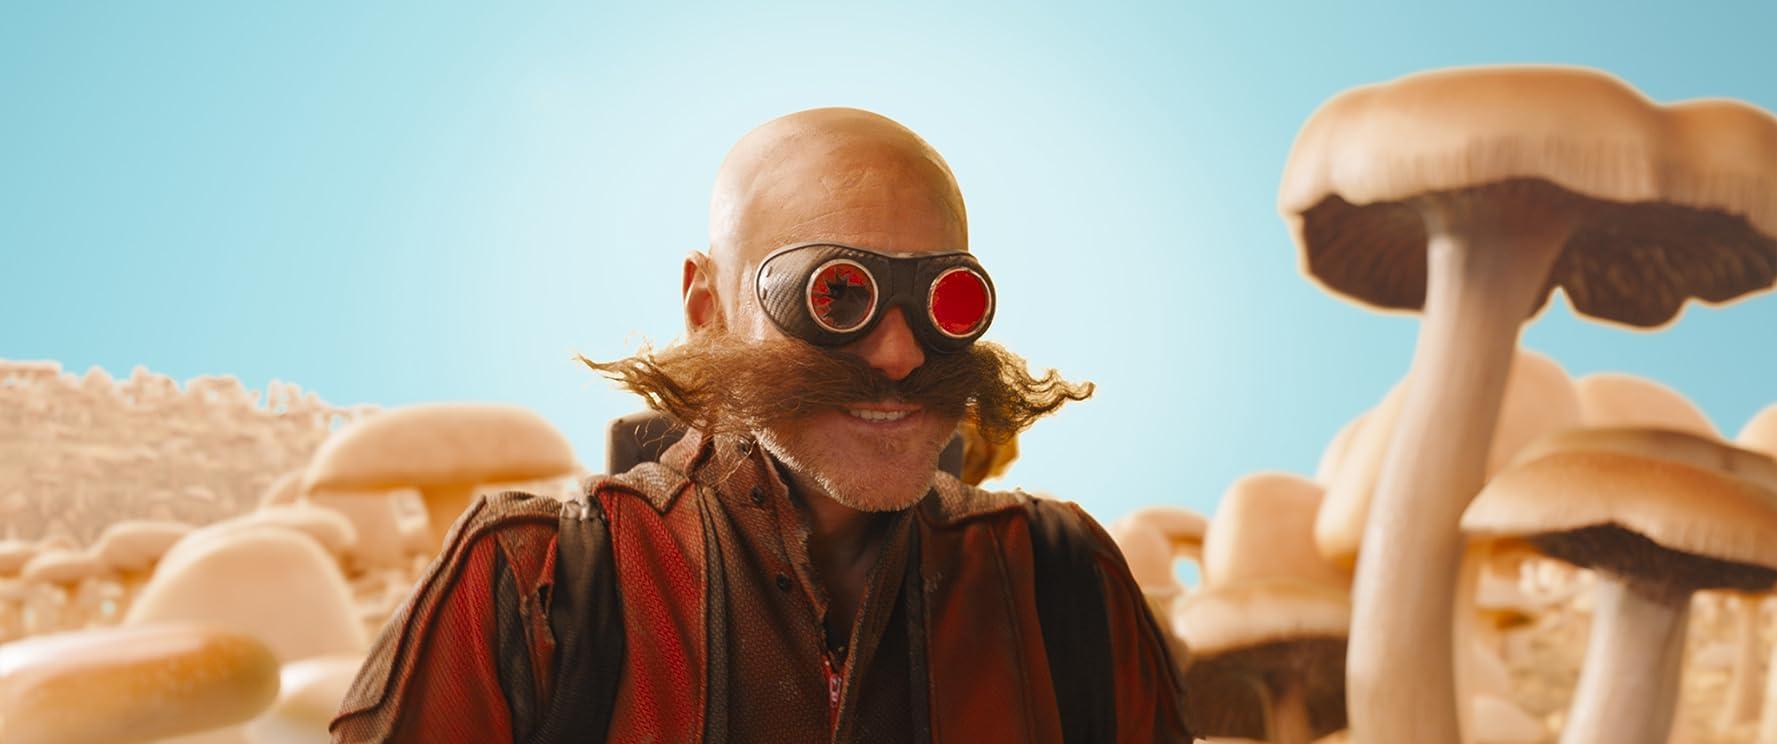 Jim Carrey in Sonic the Hedgehog (2020)